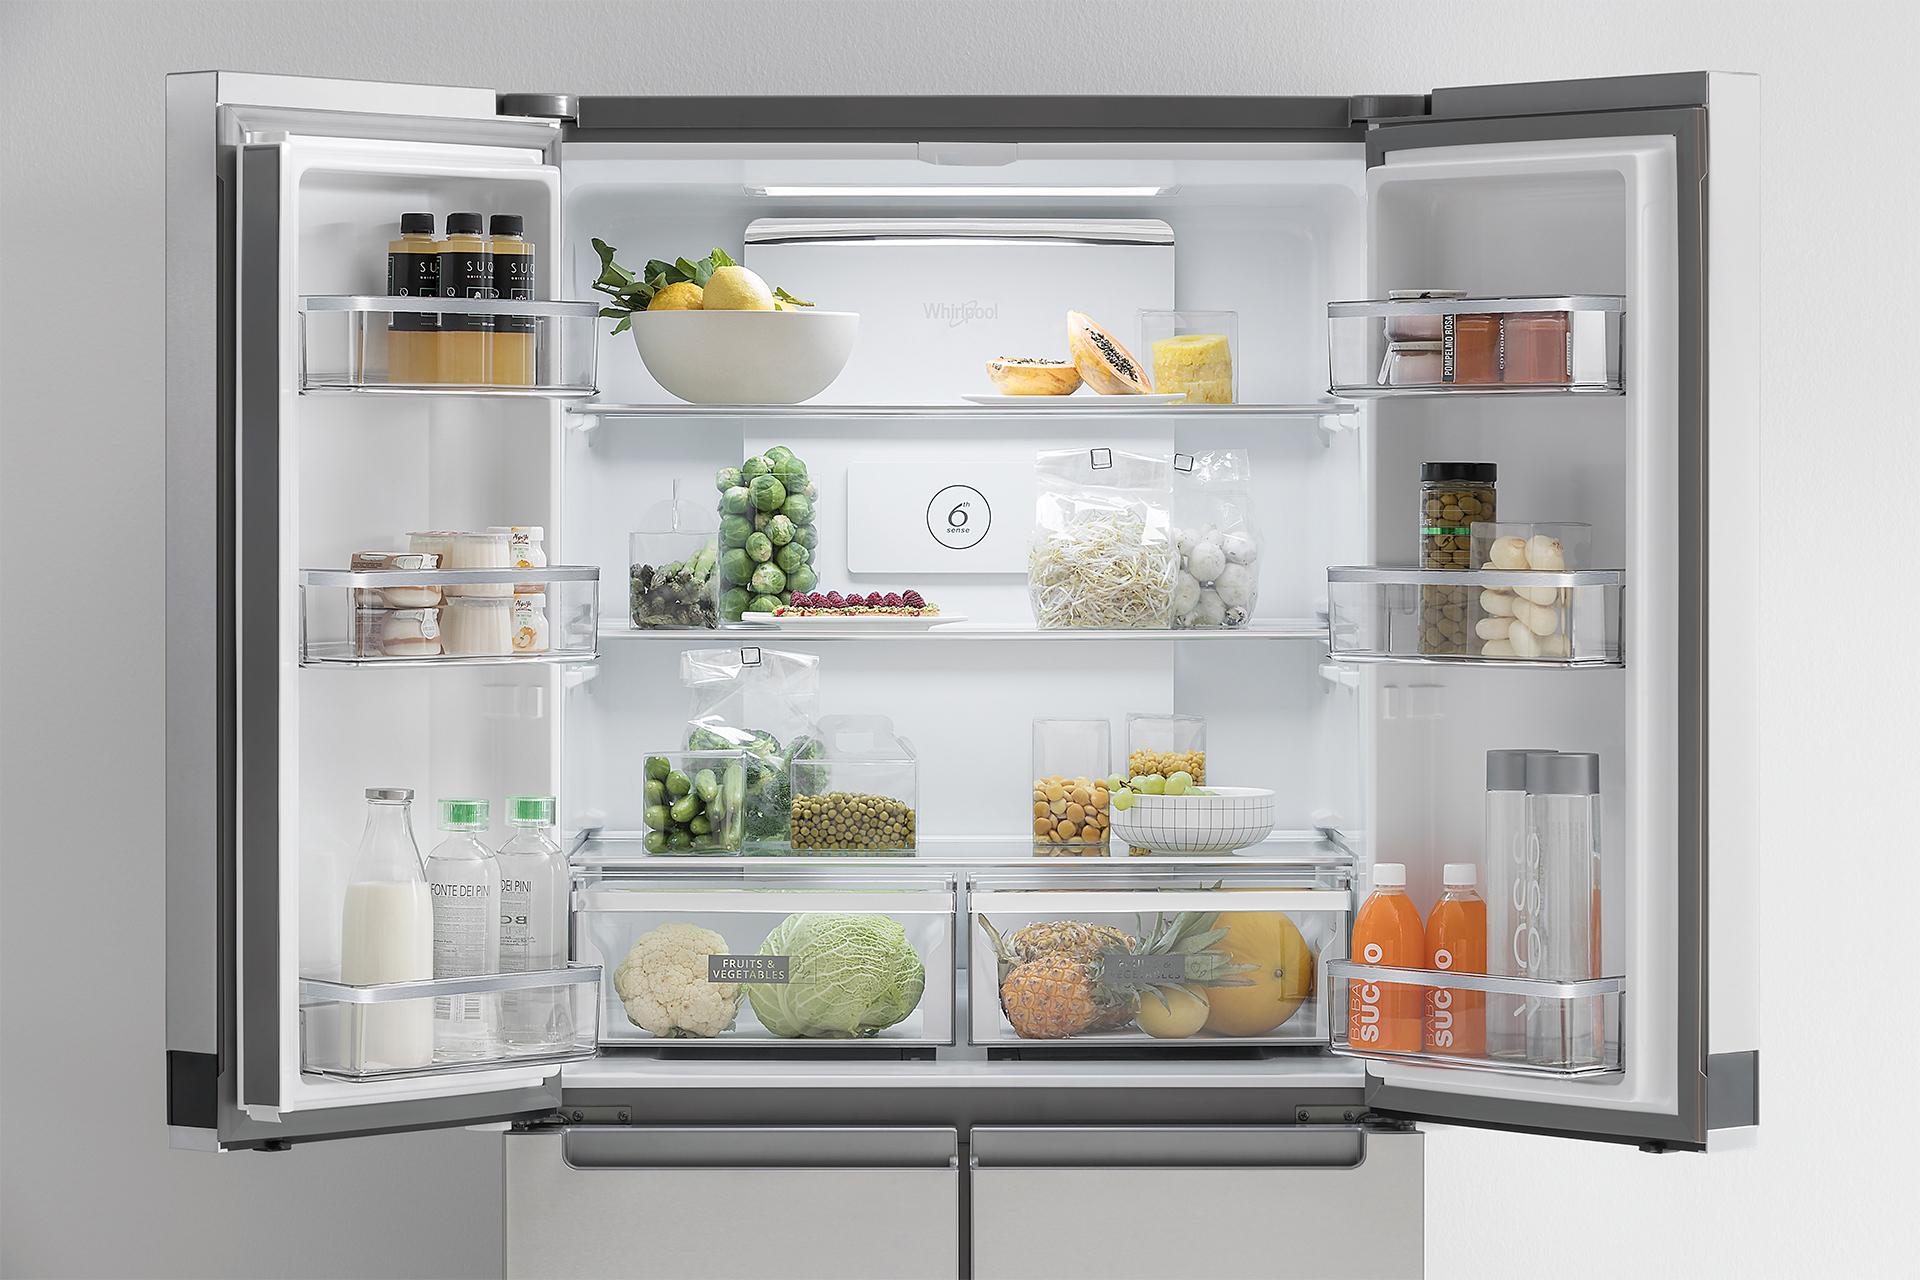 Холодильник Whirlpool серии W COLLECTION 4 Doors JUPITER